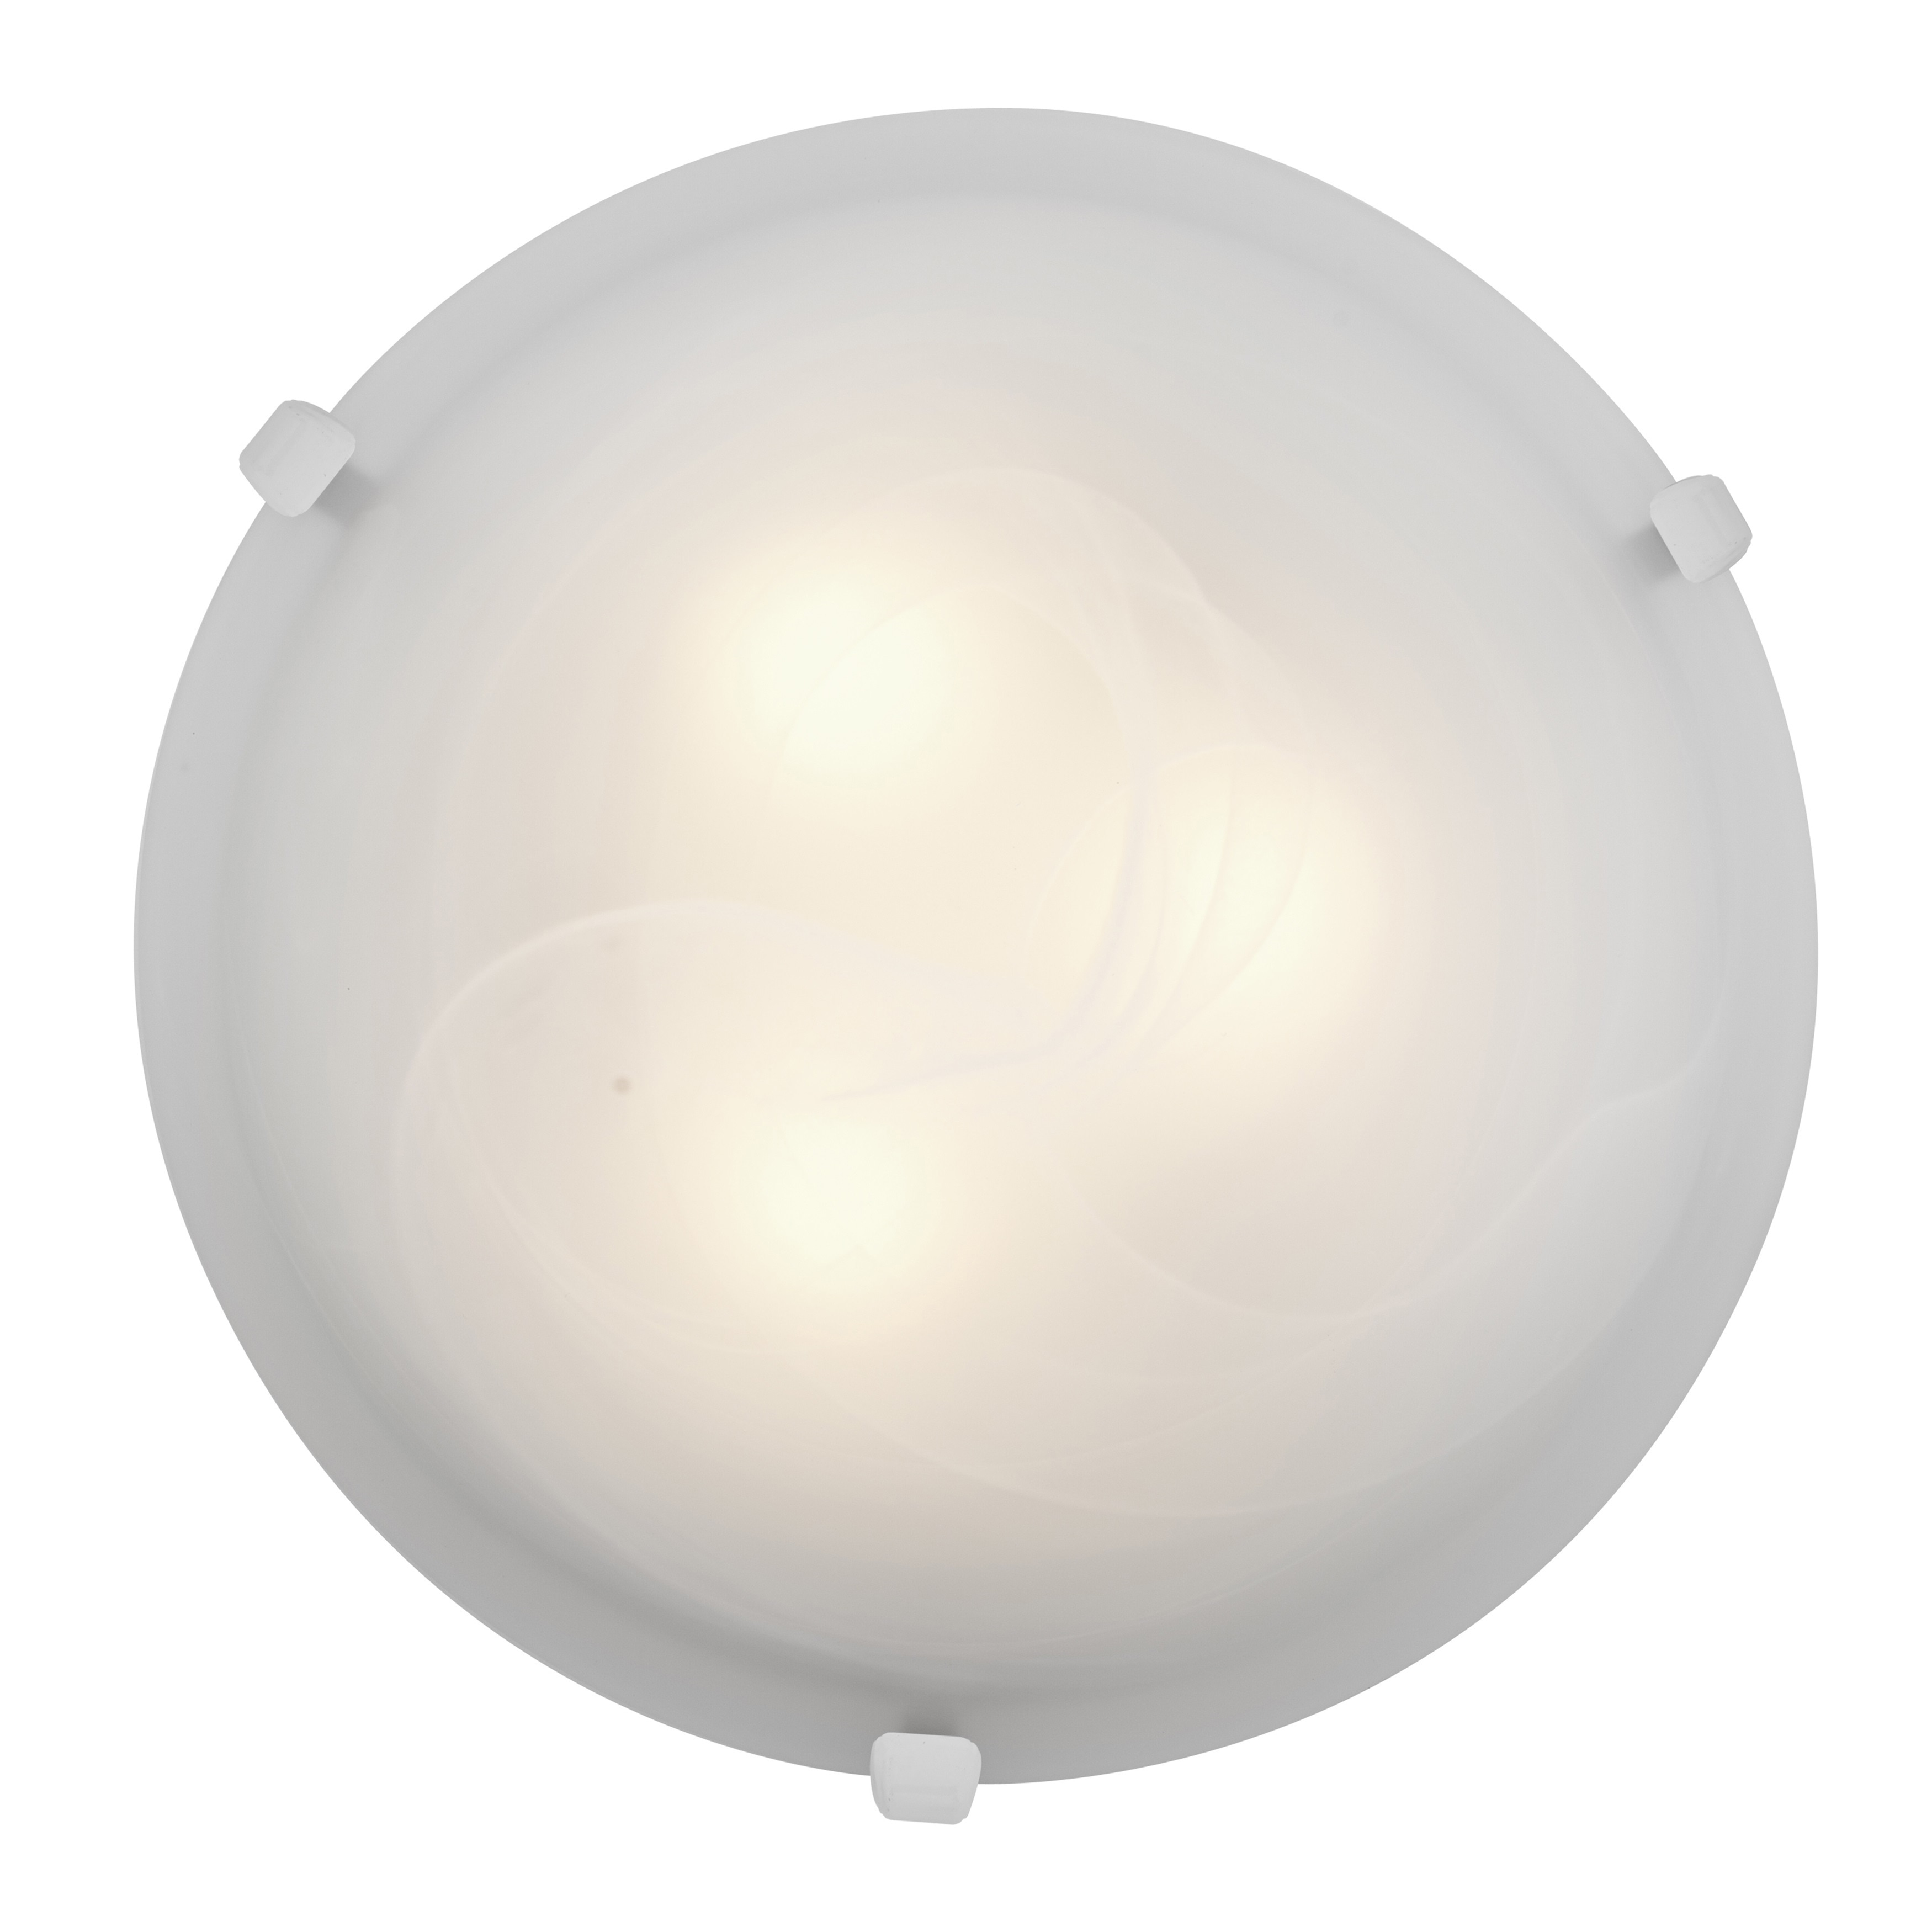 Access Lighting Mona 3-light 16 inch White Flush Mount, A...